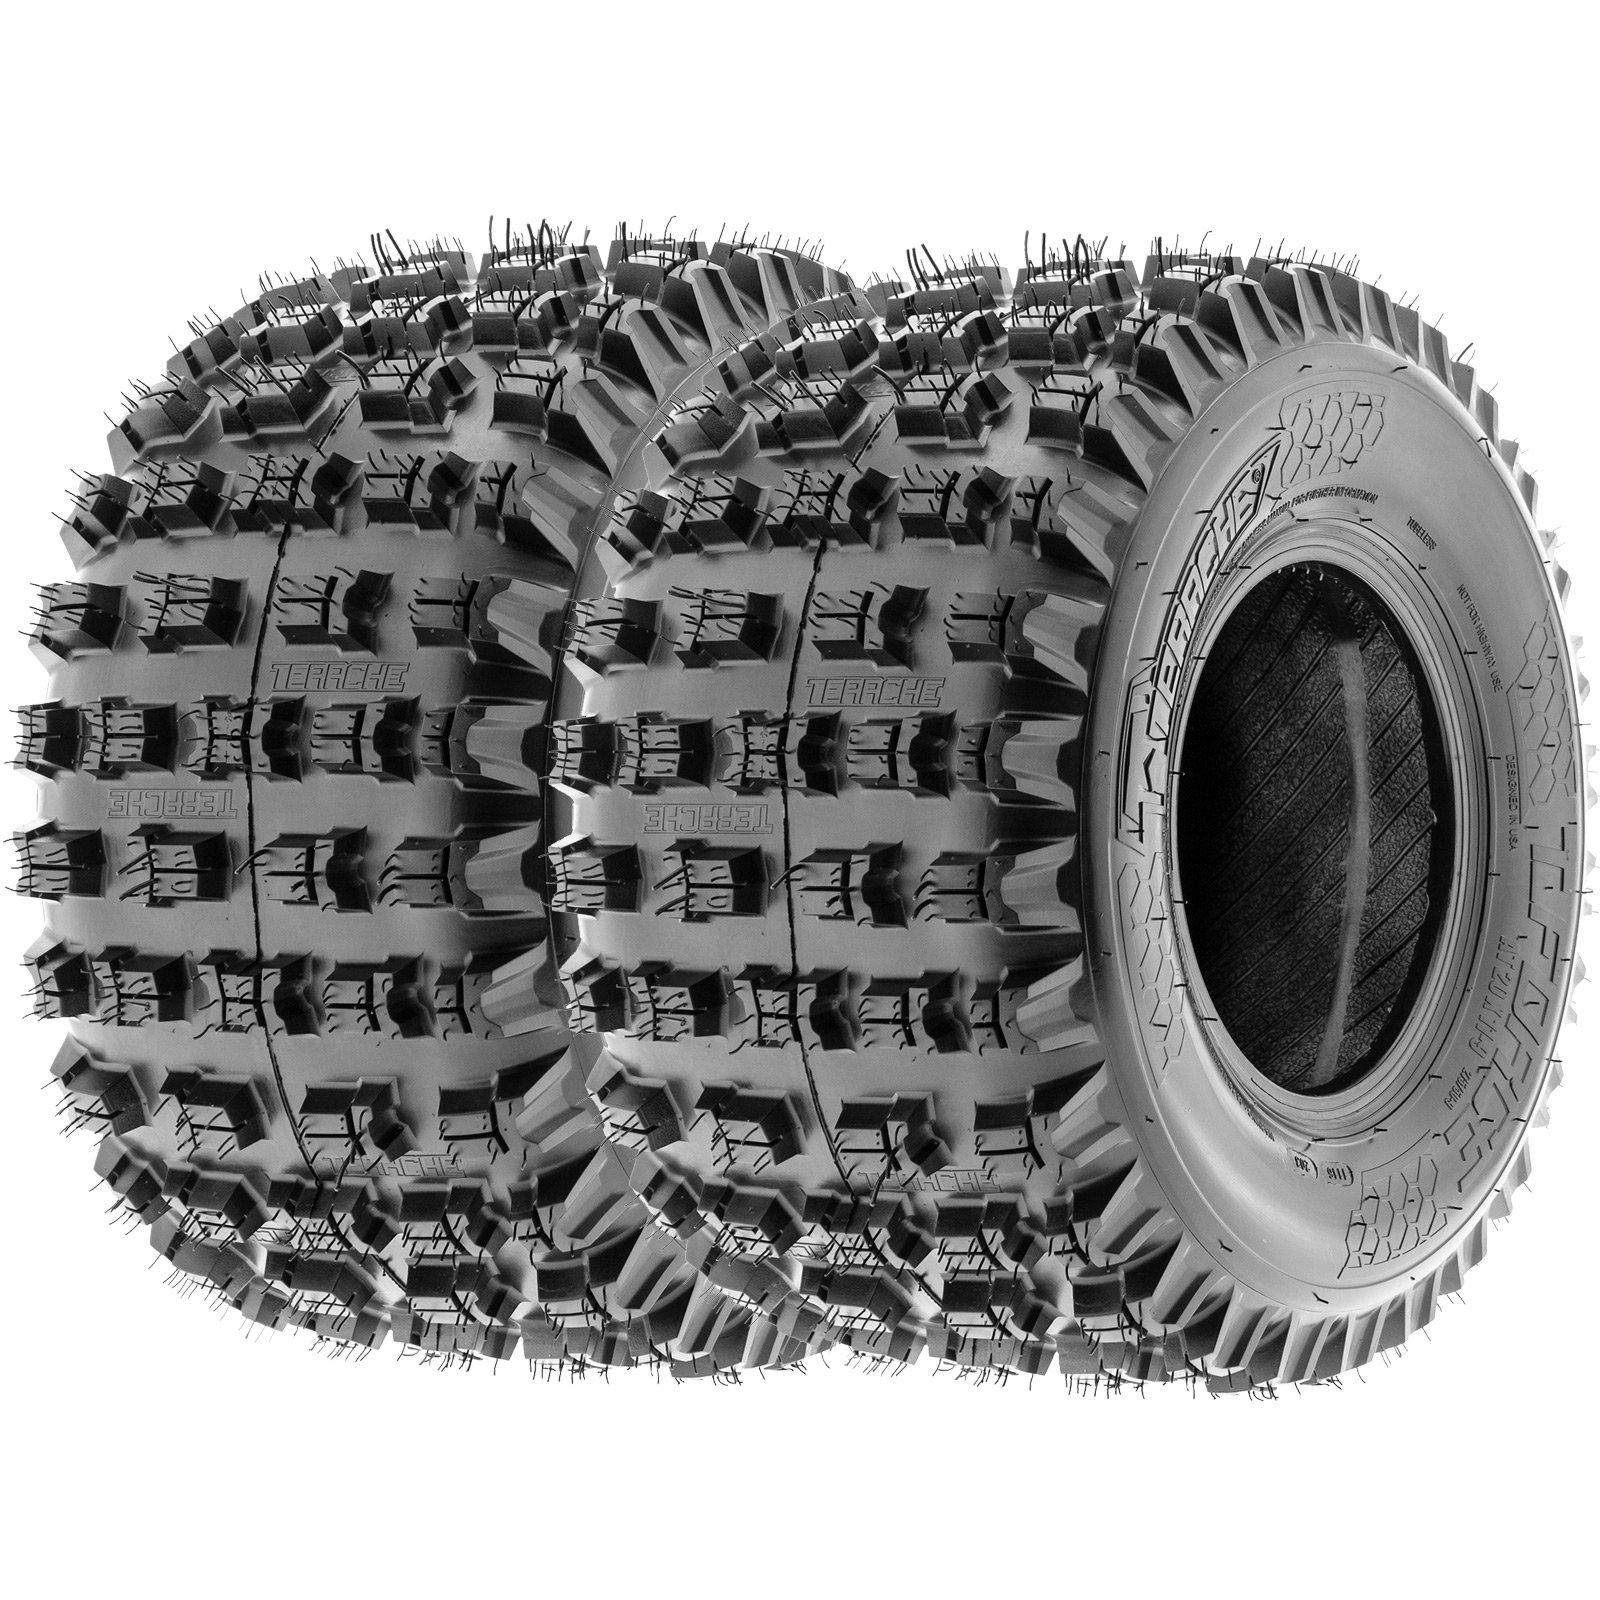 Terache T-FORCE XC ATV Knobby Tires 22x10-10 22x10x10 6 Ply (Set pair of 2)